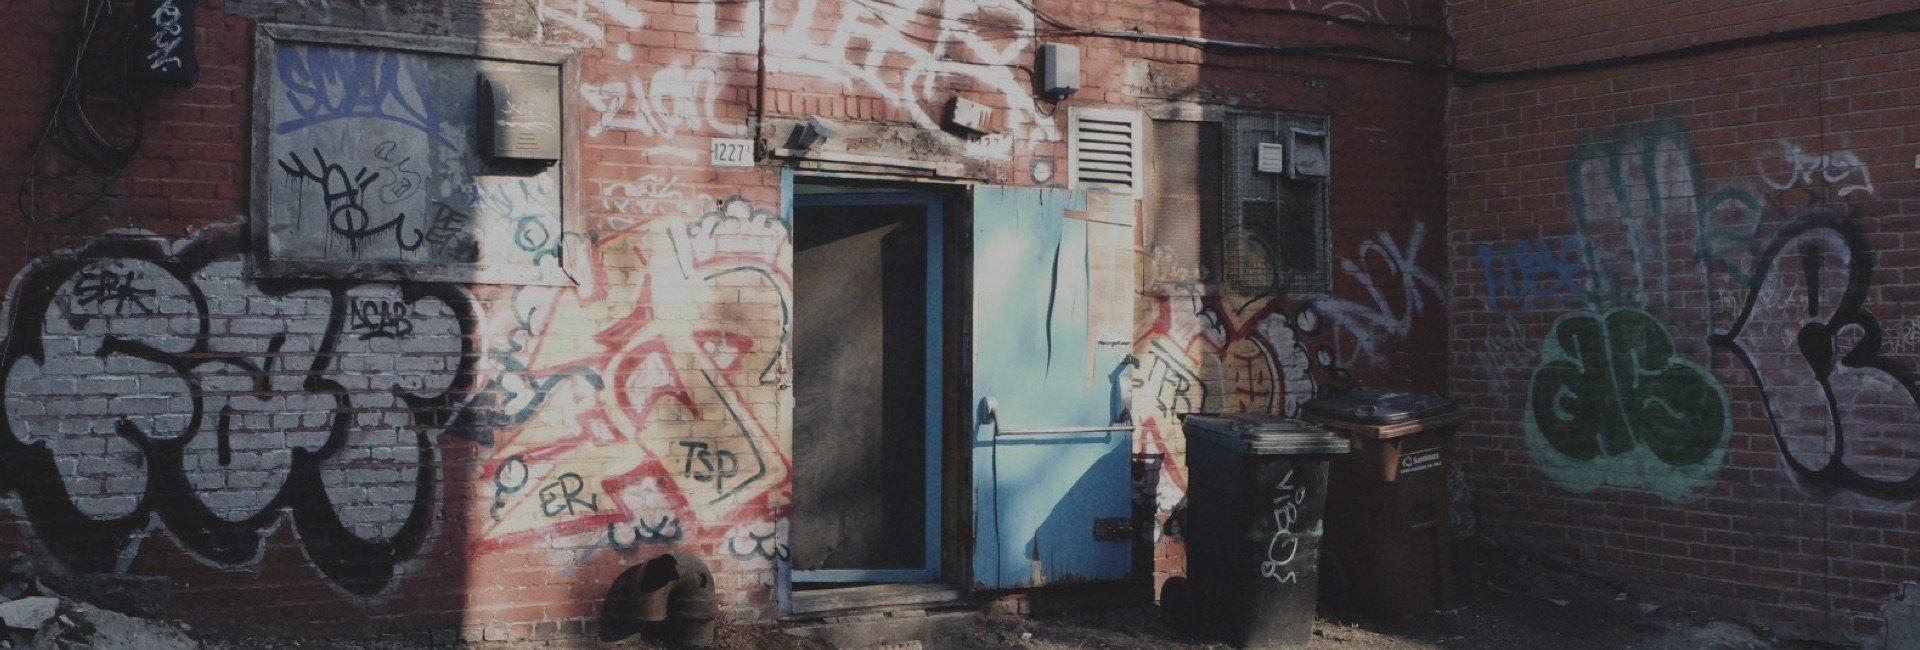 The Urban Activist